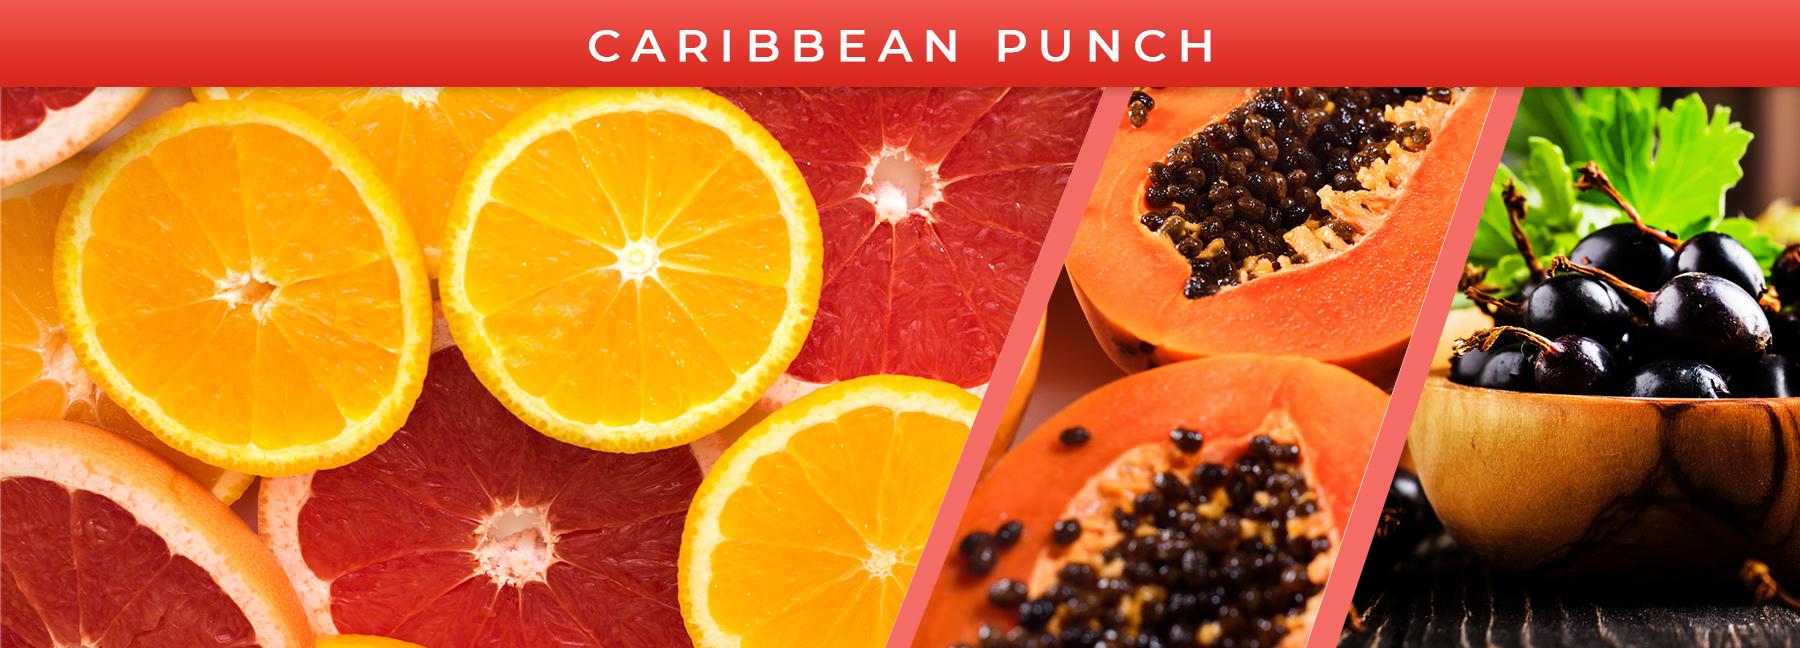 Caribbean Punch fragrance elements